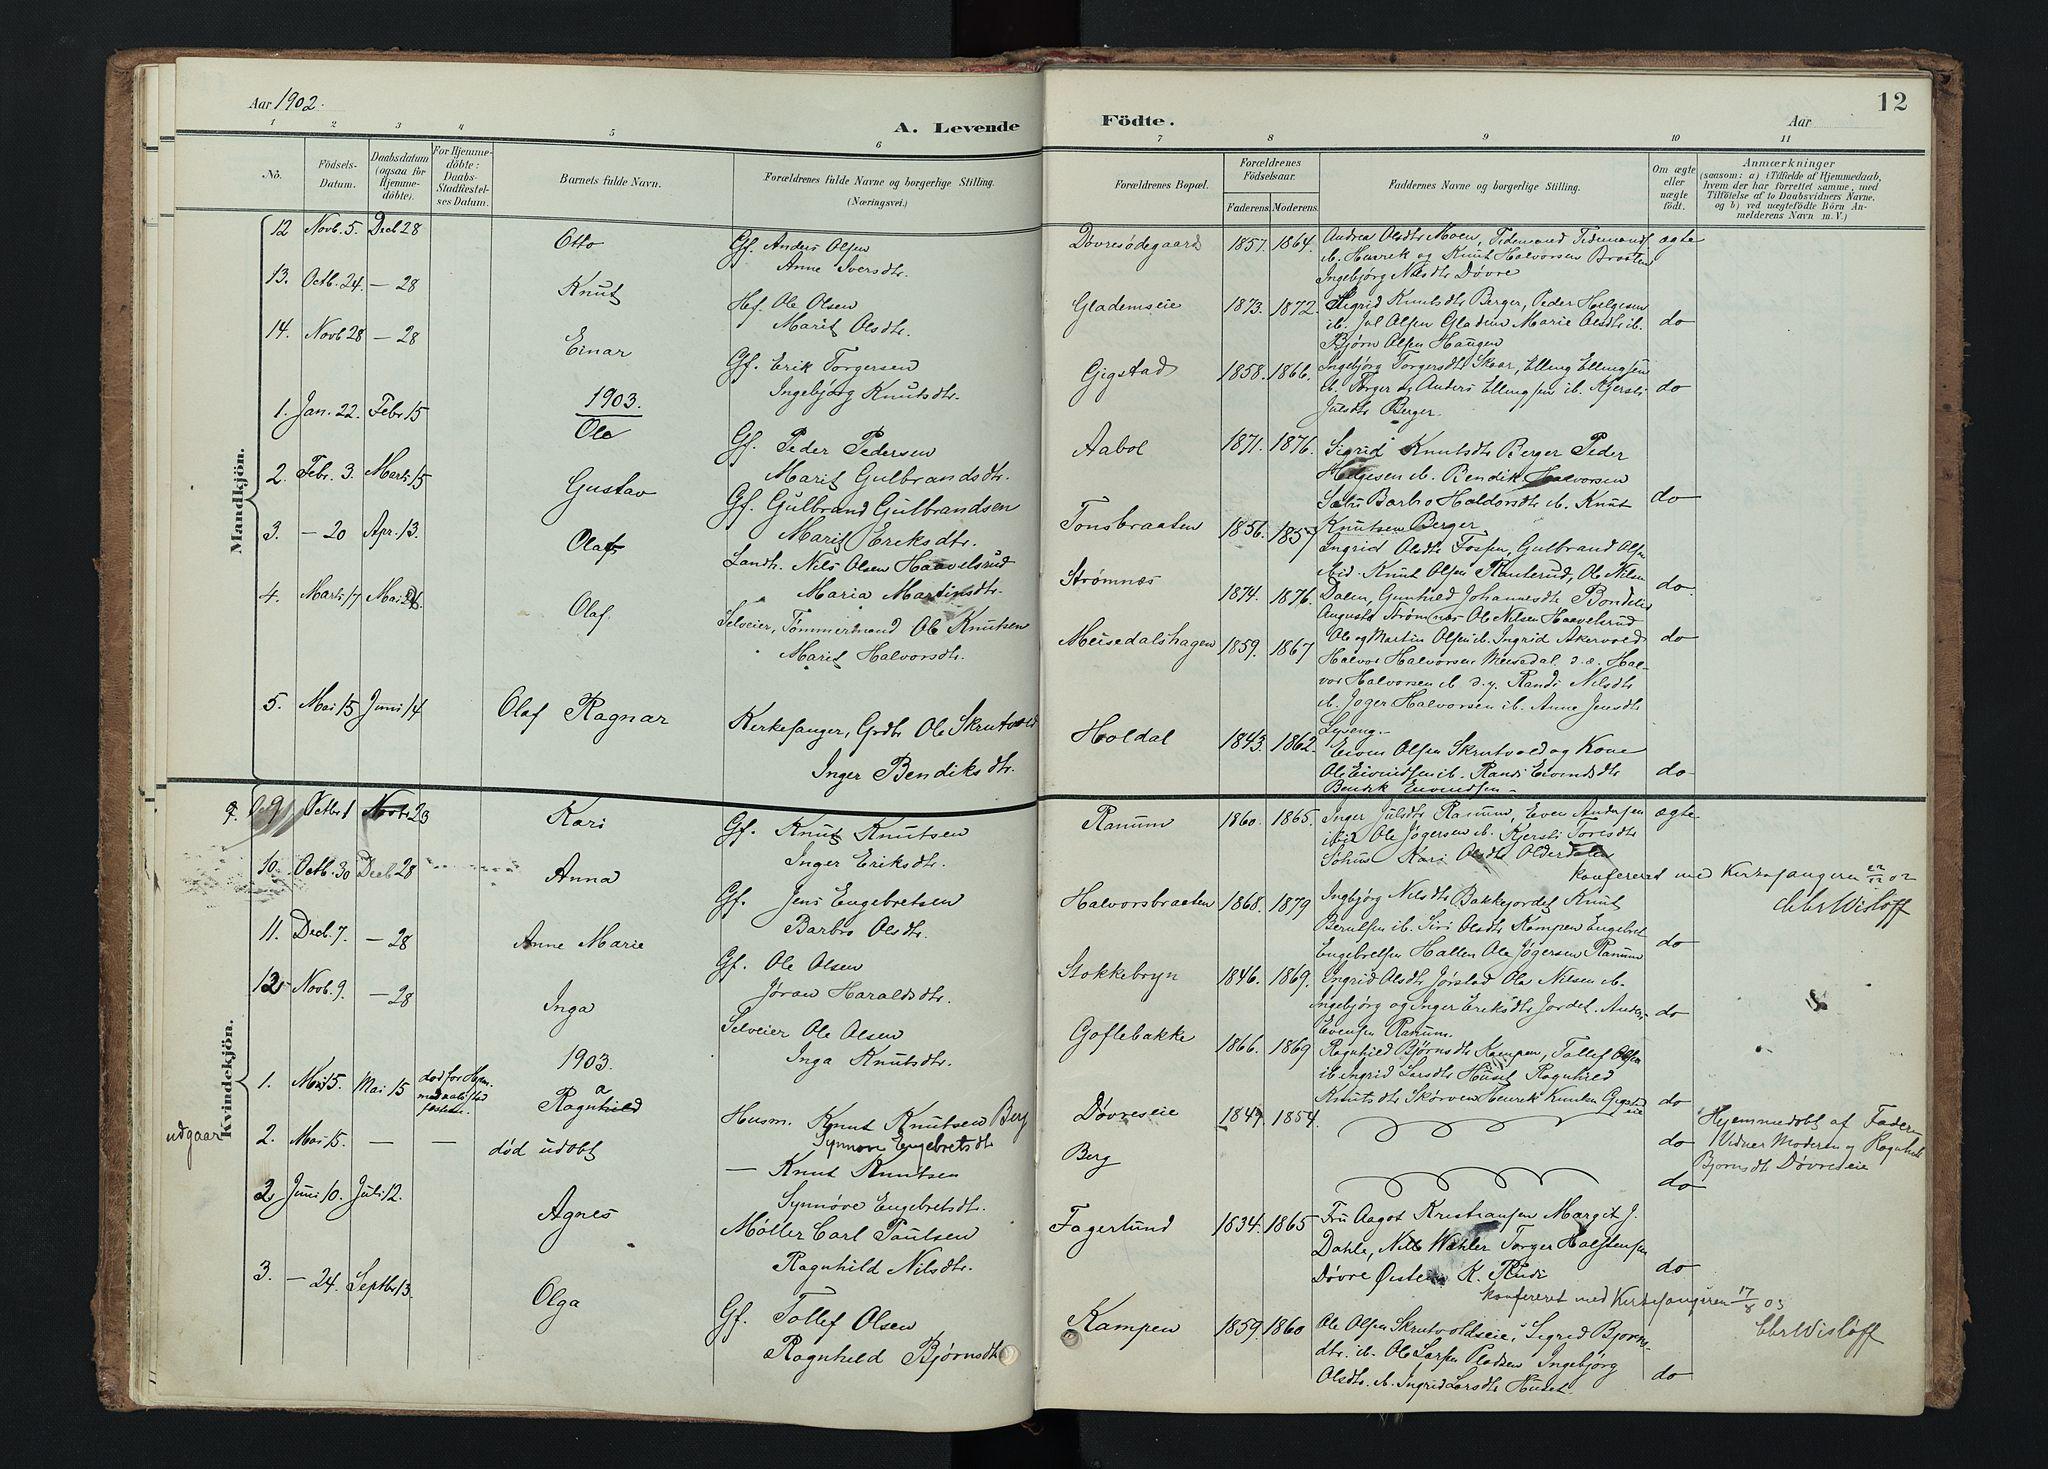 SAH, Nord-Aurdal prestekontor, Ministerialbok nr. 15, 1896-1914, s. 12